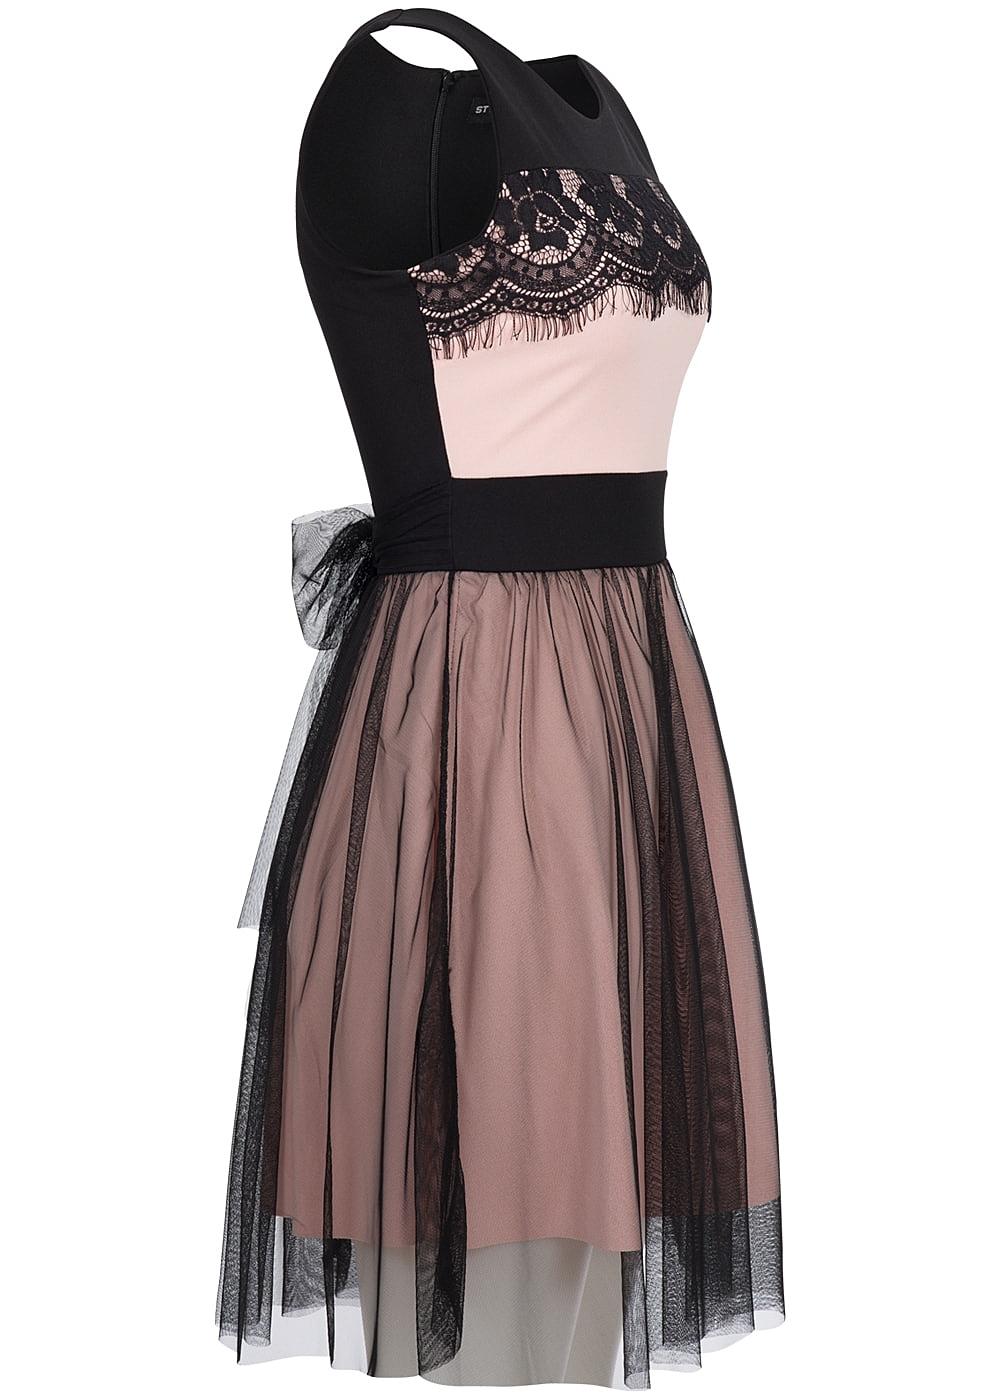 styleboom fashion damen mini kleid spitze zipper hinten t ll rosa schwarz 77onlineshop. Black Bedroom Furniture Sets. Home Design Ideas